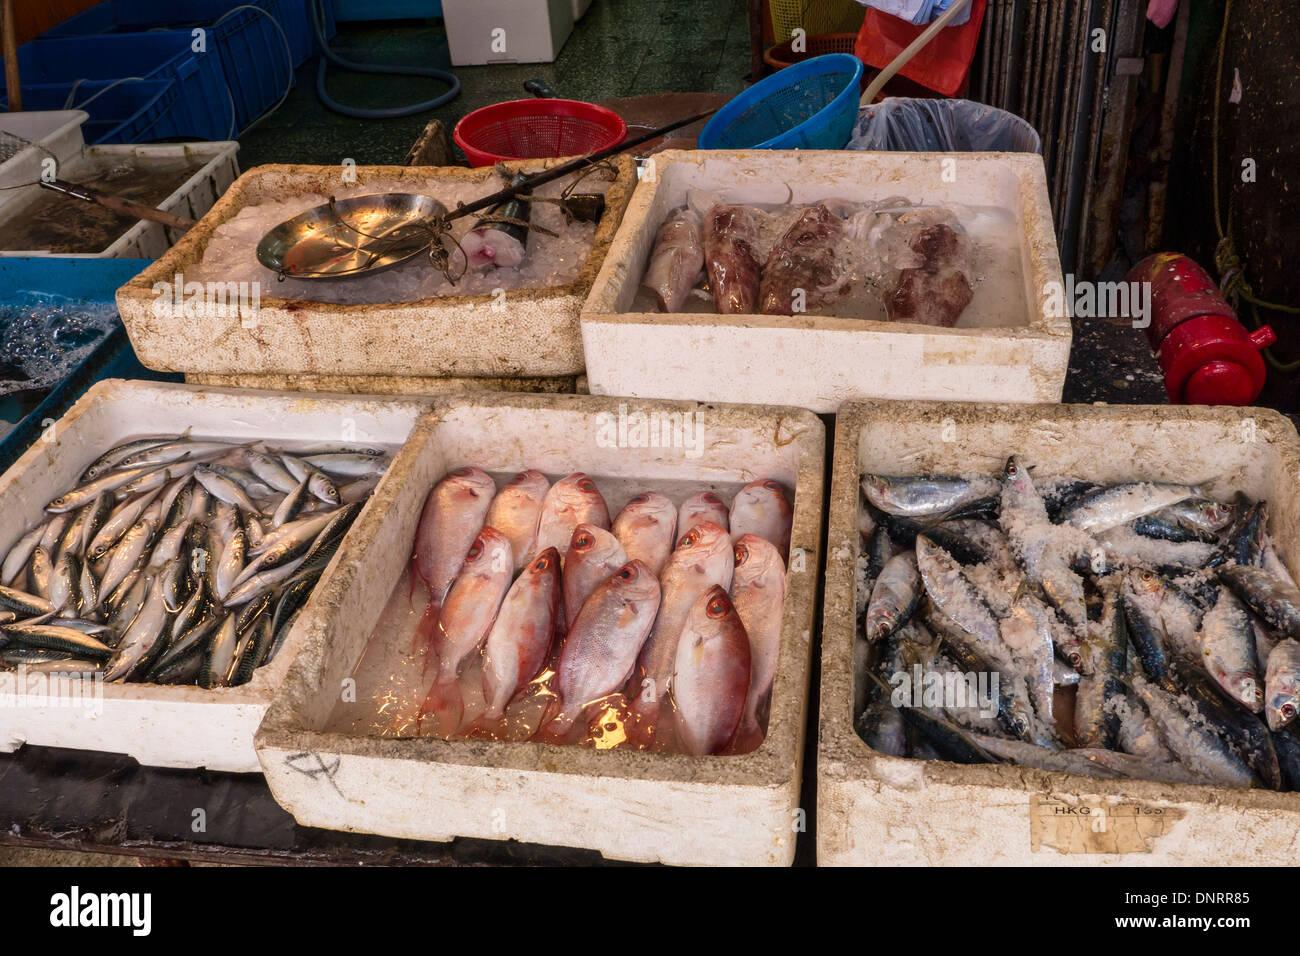 Seafood Market, Lantau Island, Hong Kong, China - Stock Image